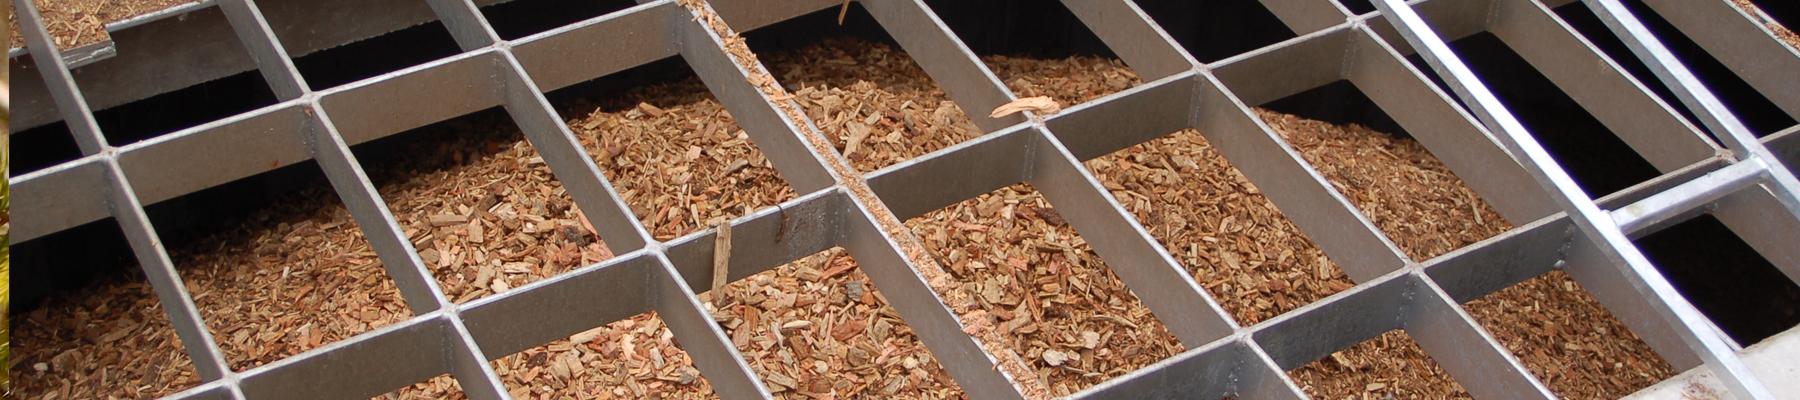 Biomass-fuels8